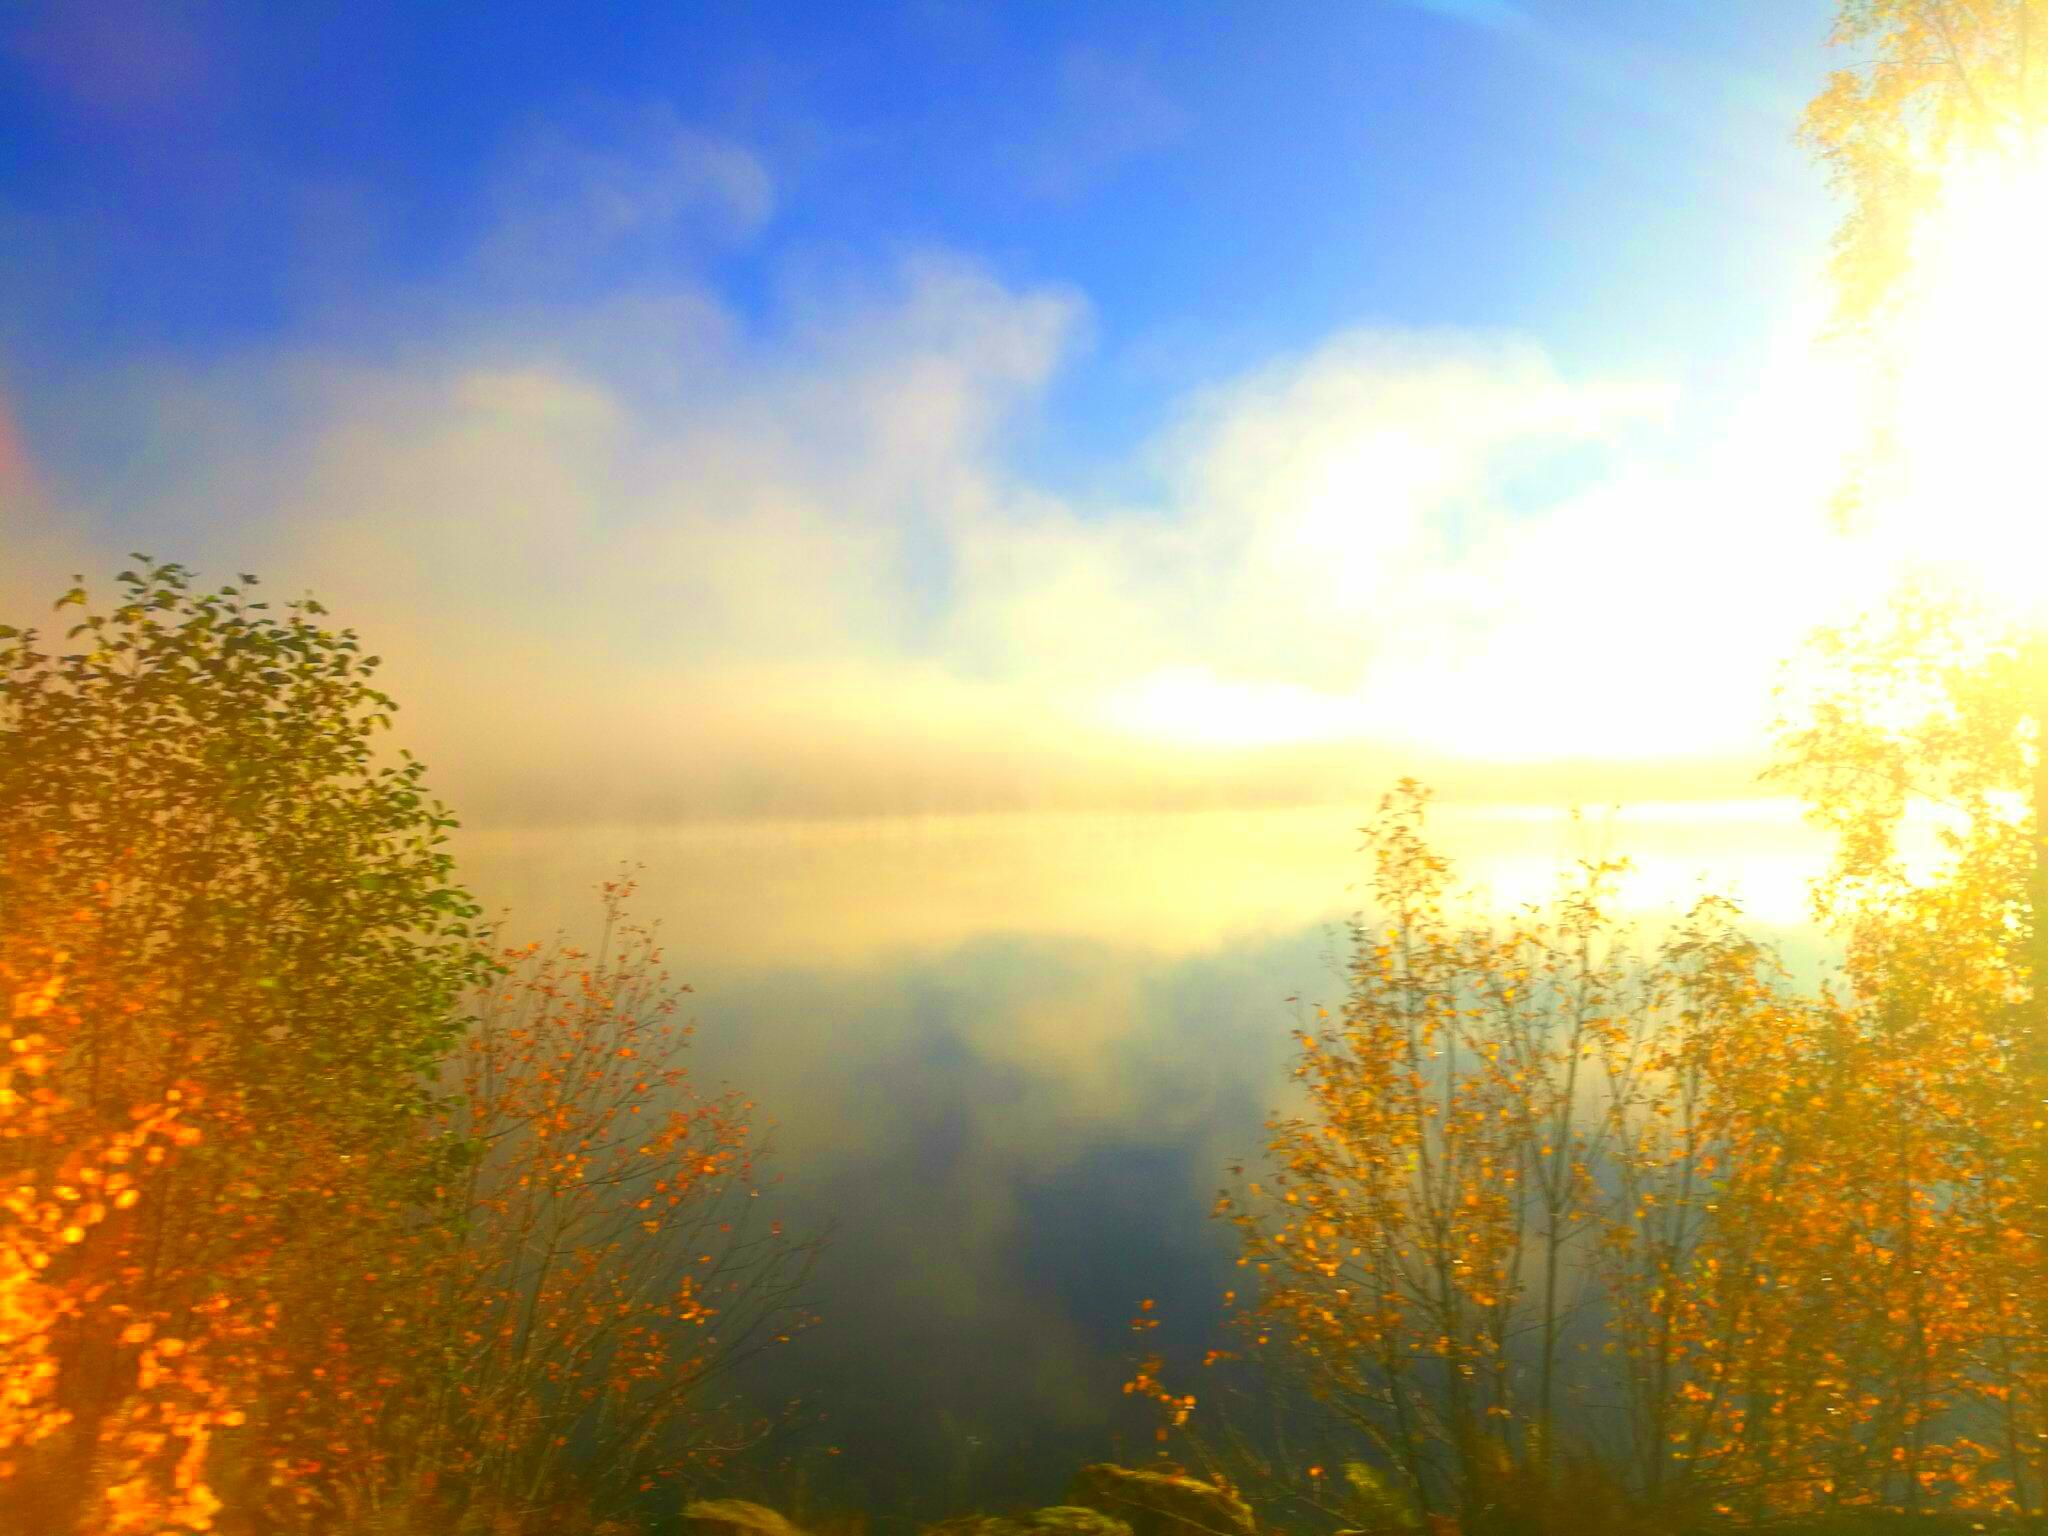 nature gods blogs christian